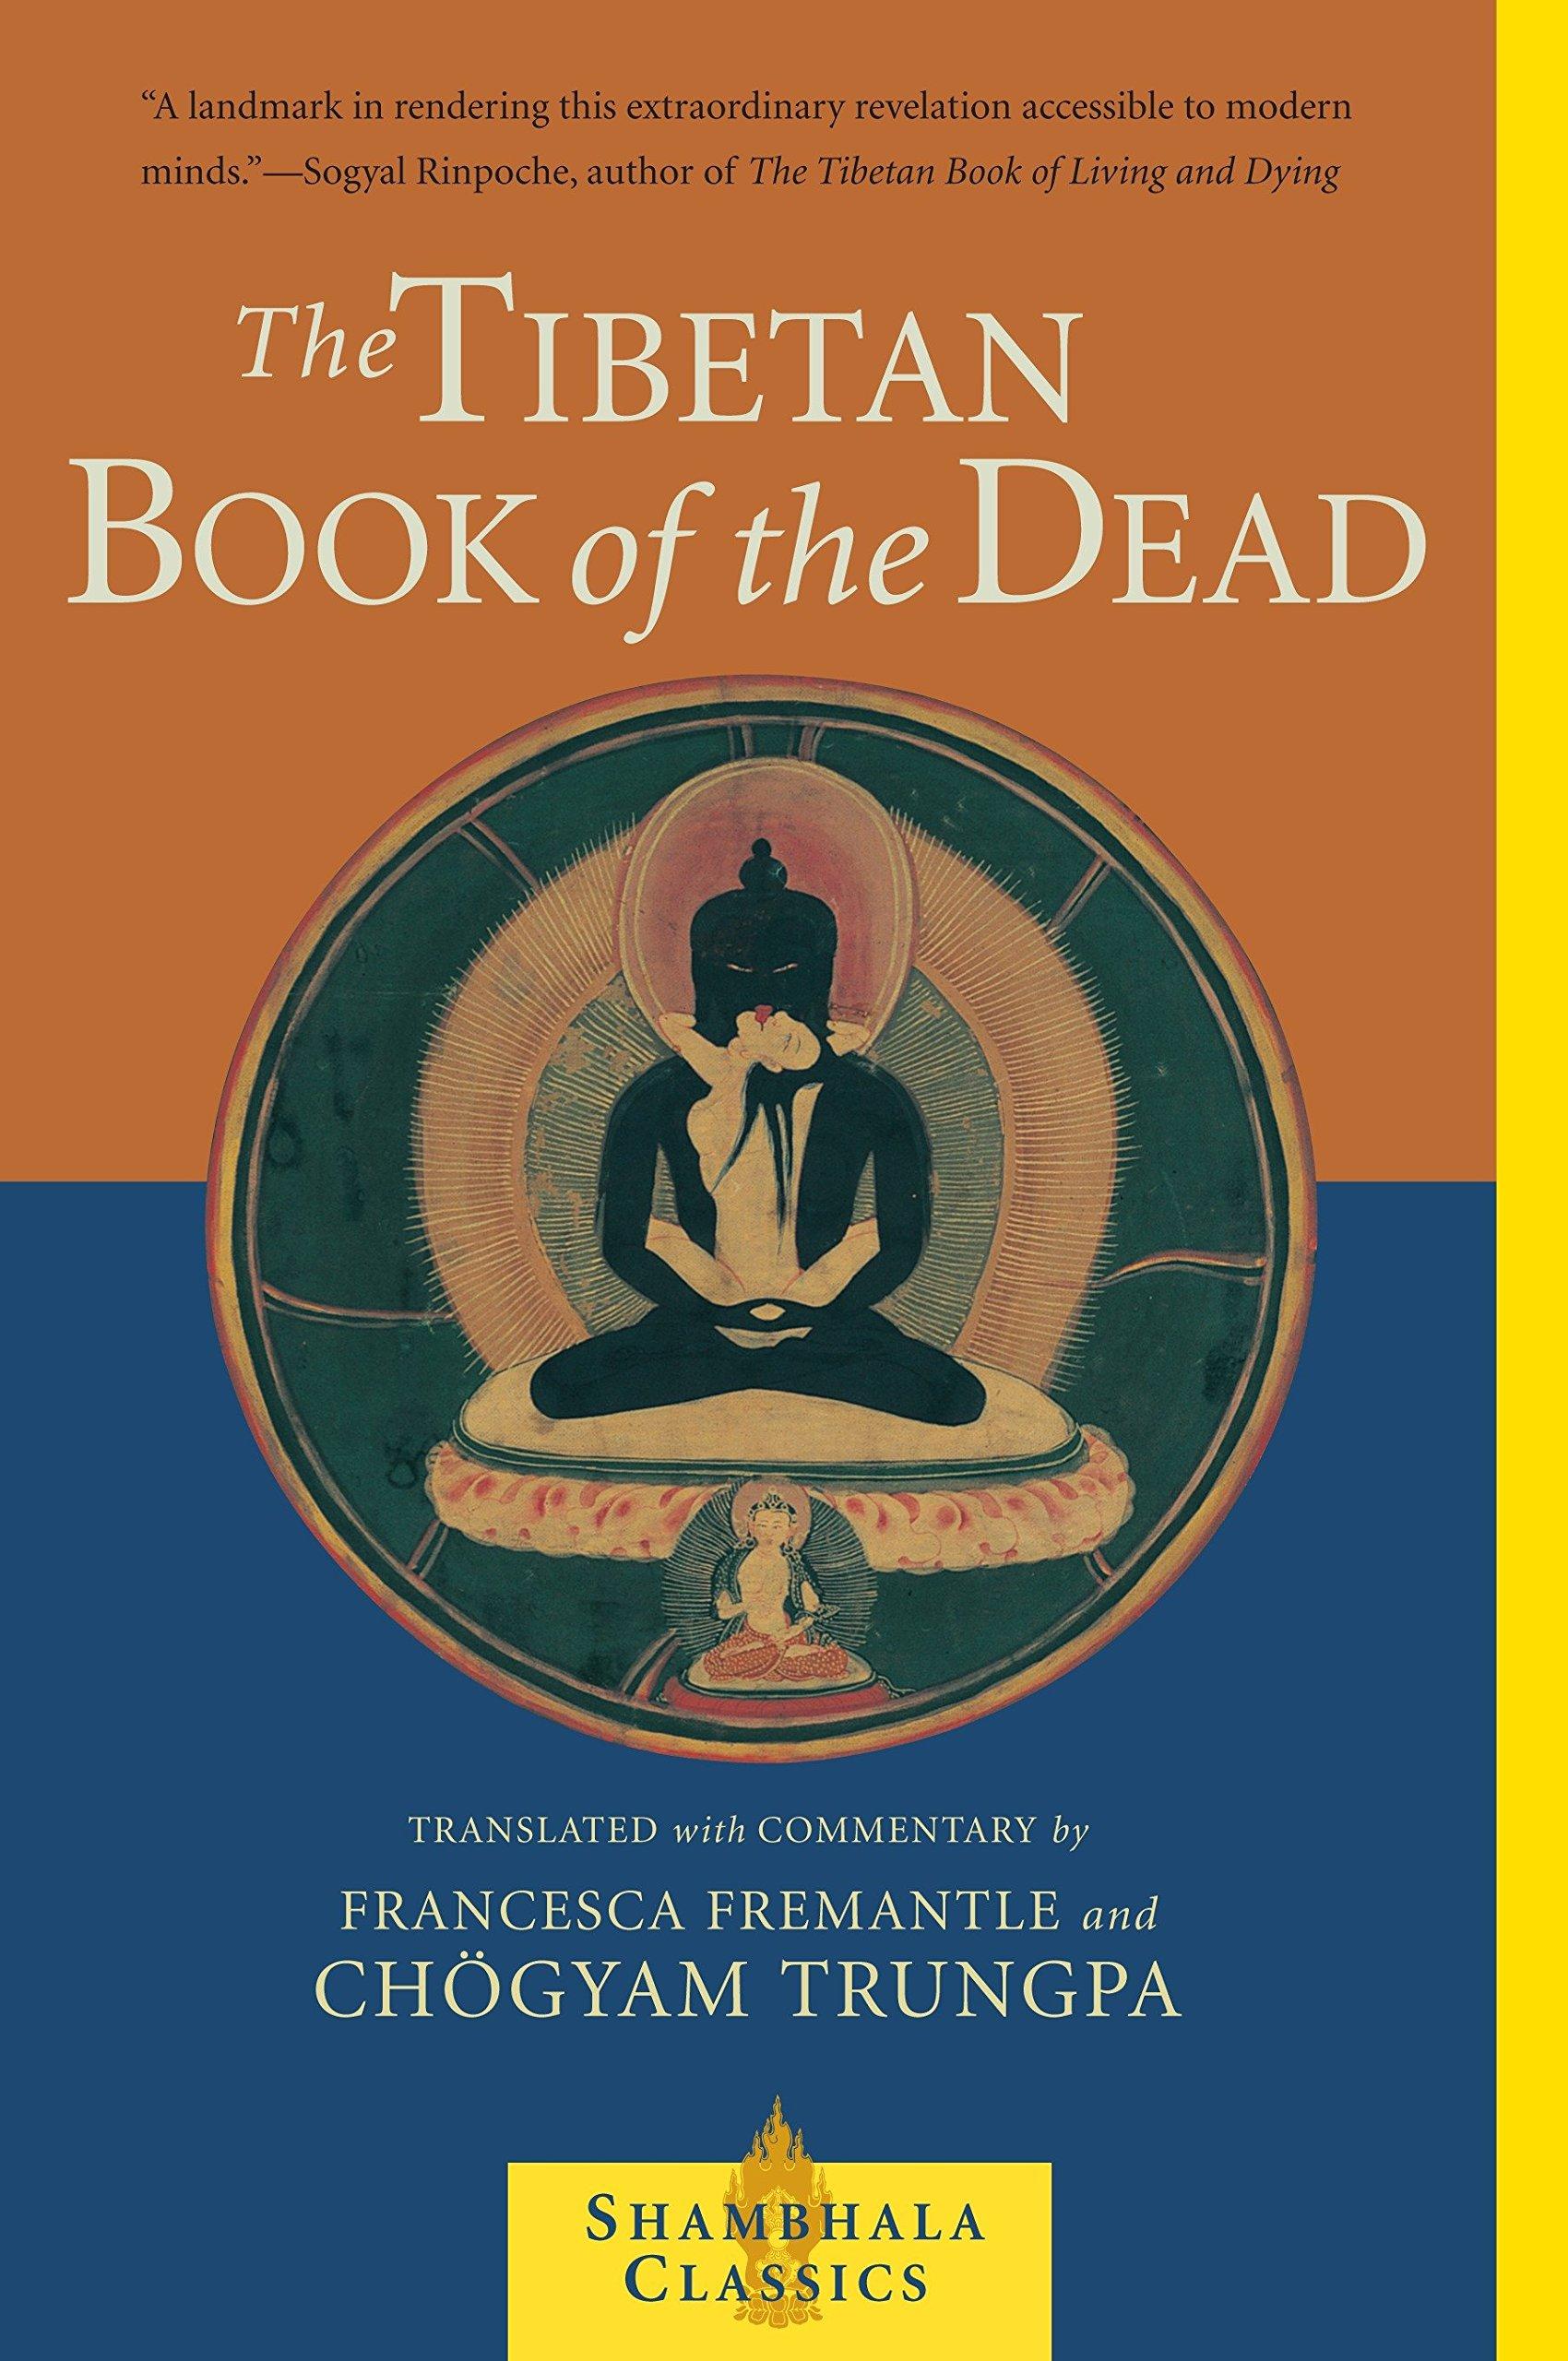 The Tibetan Book of the Dead: The Great Liberation Through Hearing In The Bardo (Shambhala Classics) pdf